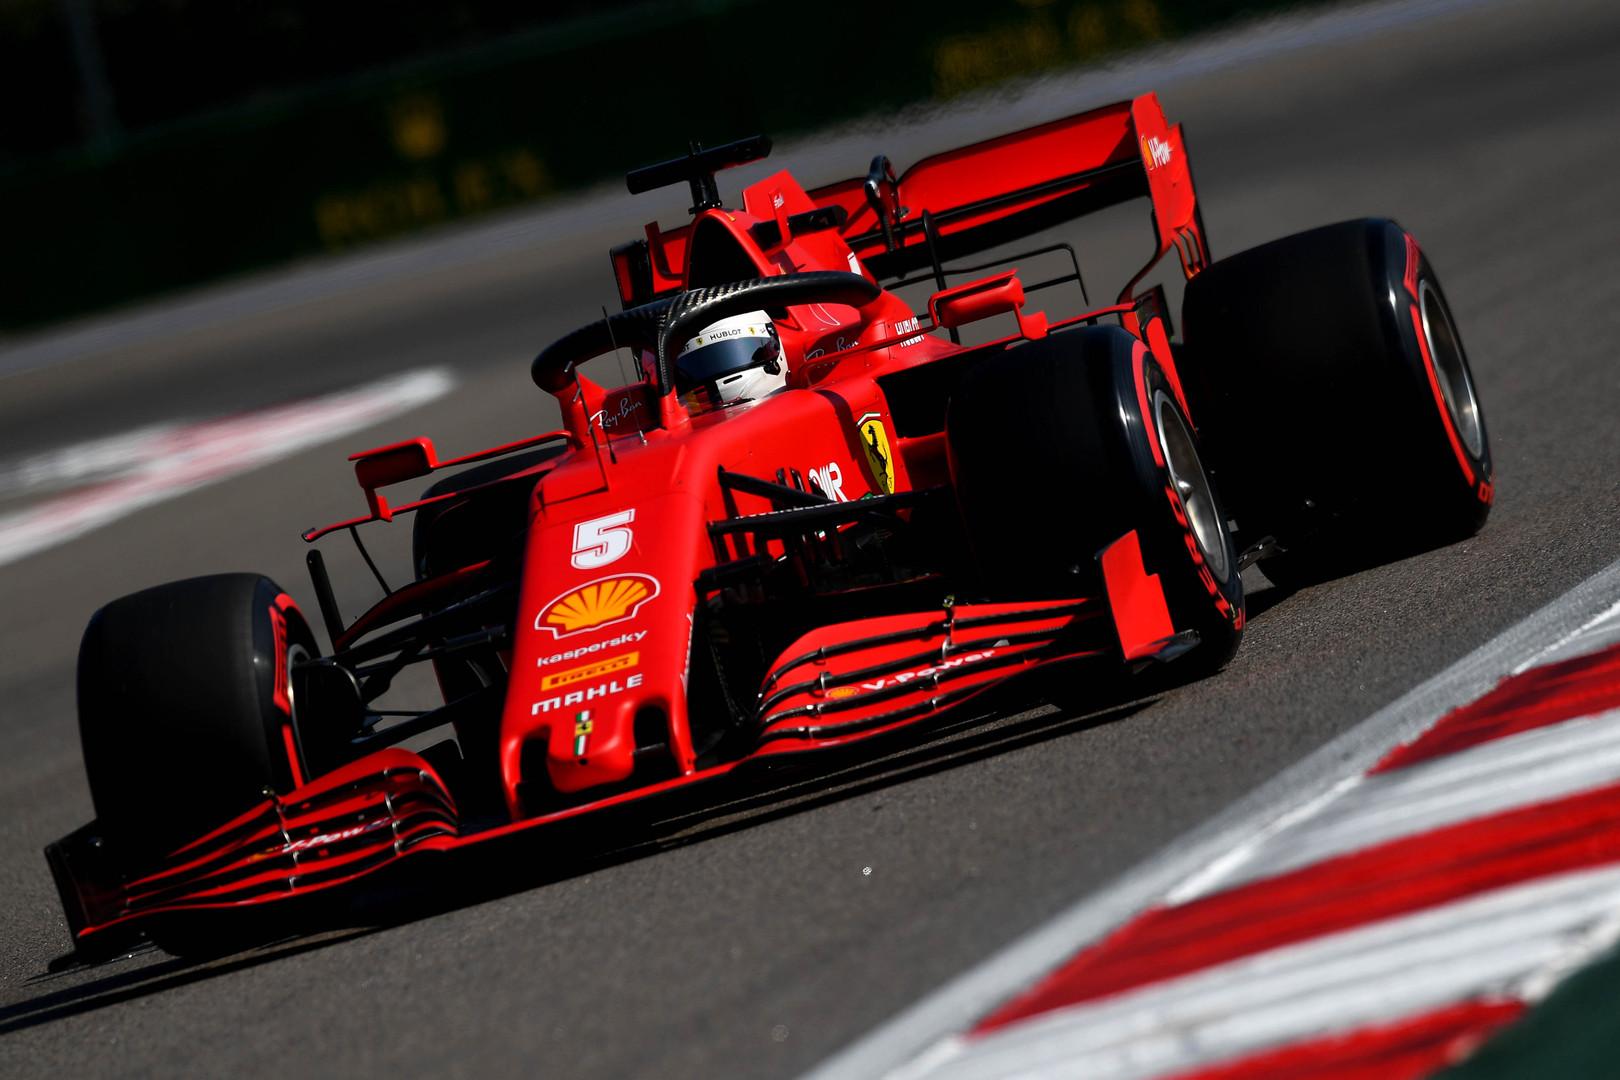 T. Wolffas galvojo kviestis S. Vettelį